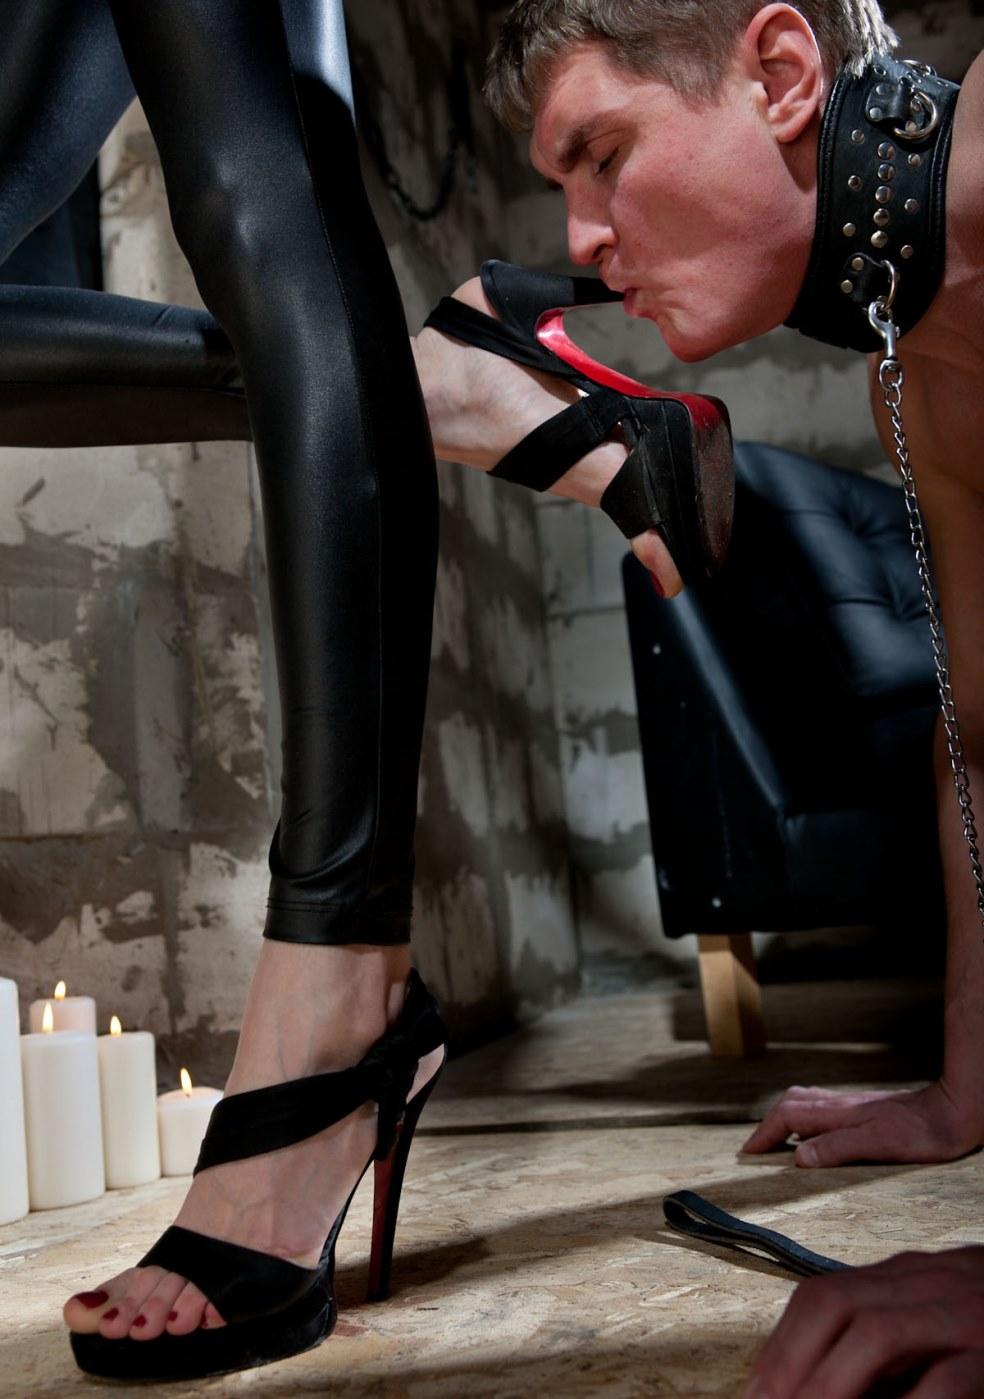 Collared Slave Sucks Dirty High Heel With Cruel Russian Mistress Jane Close-Up